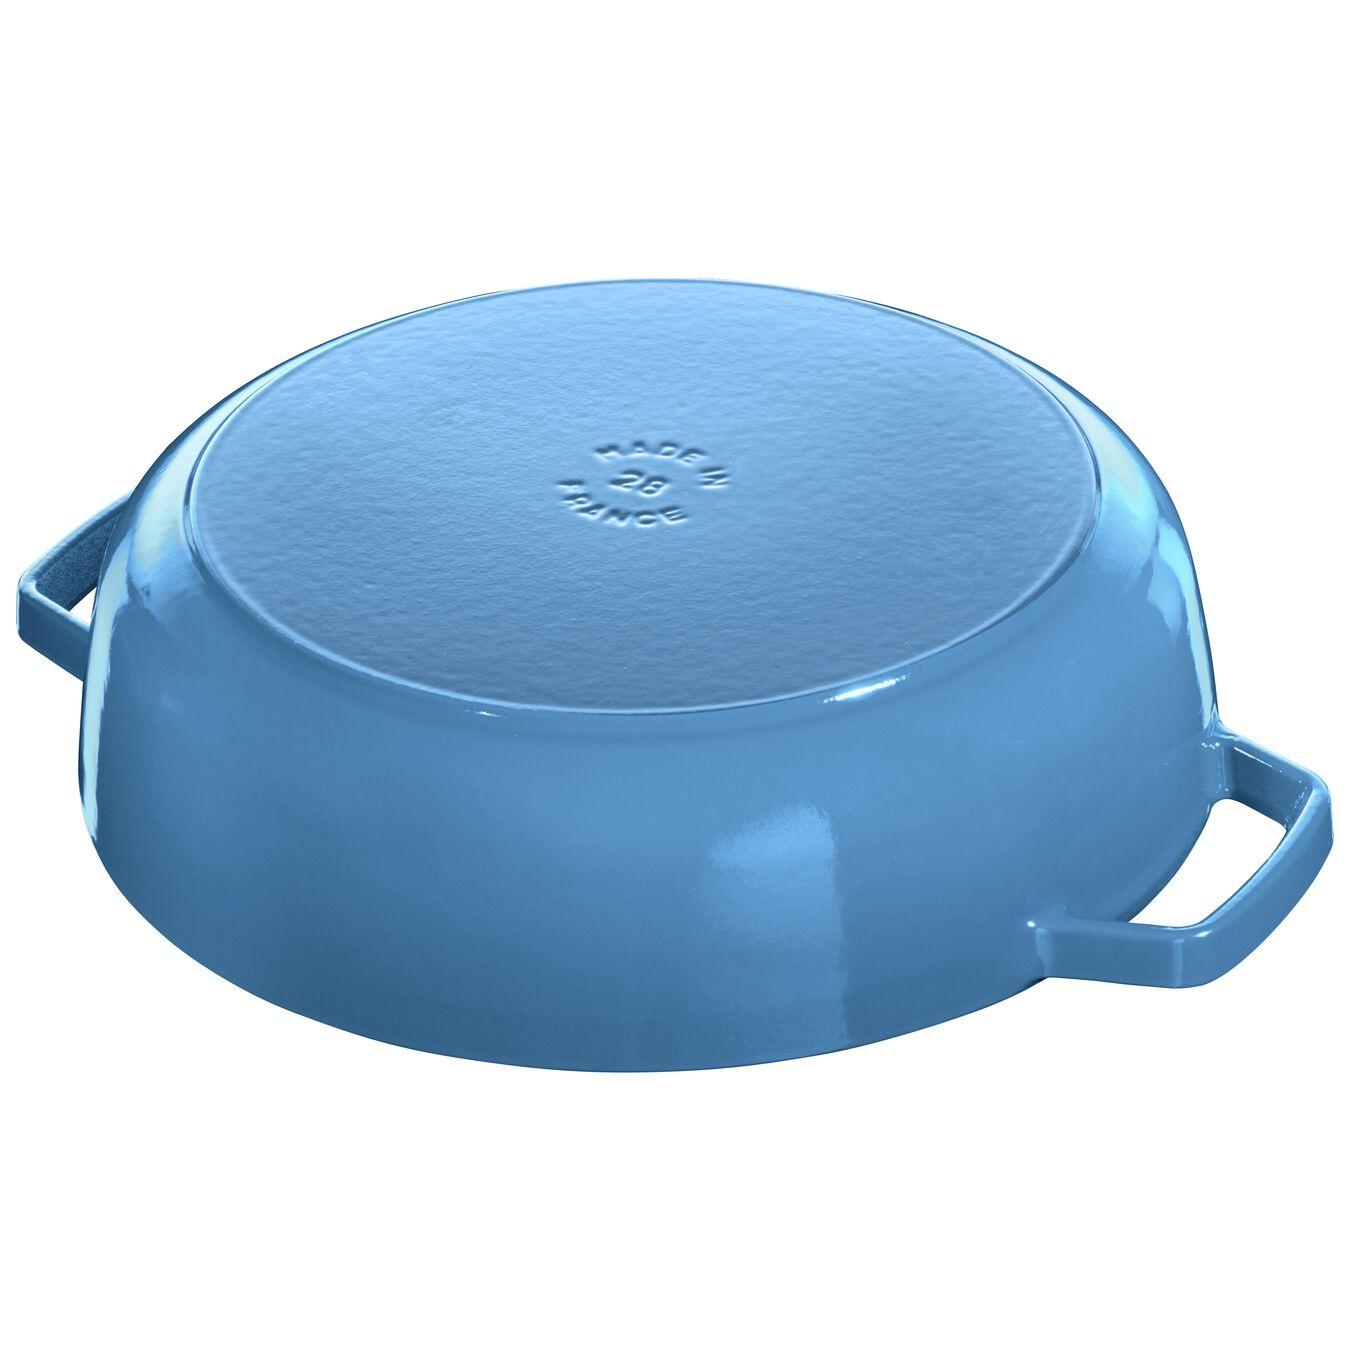 3.75 l round Saute pan Chistera, ice-blue,,large 6